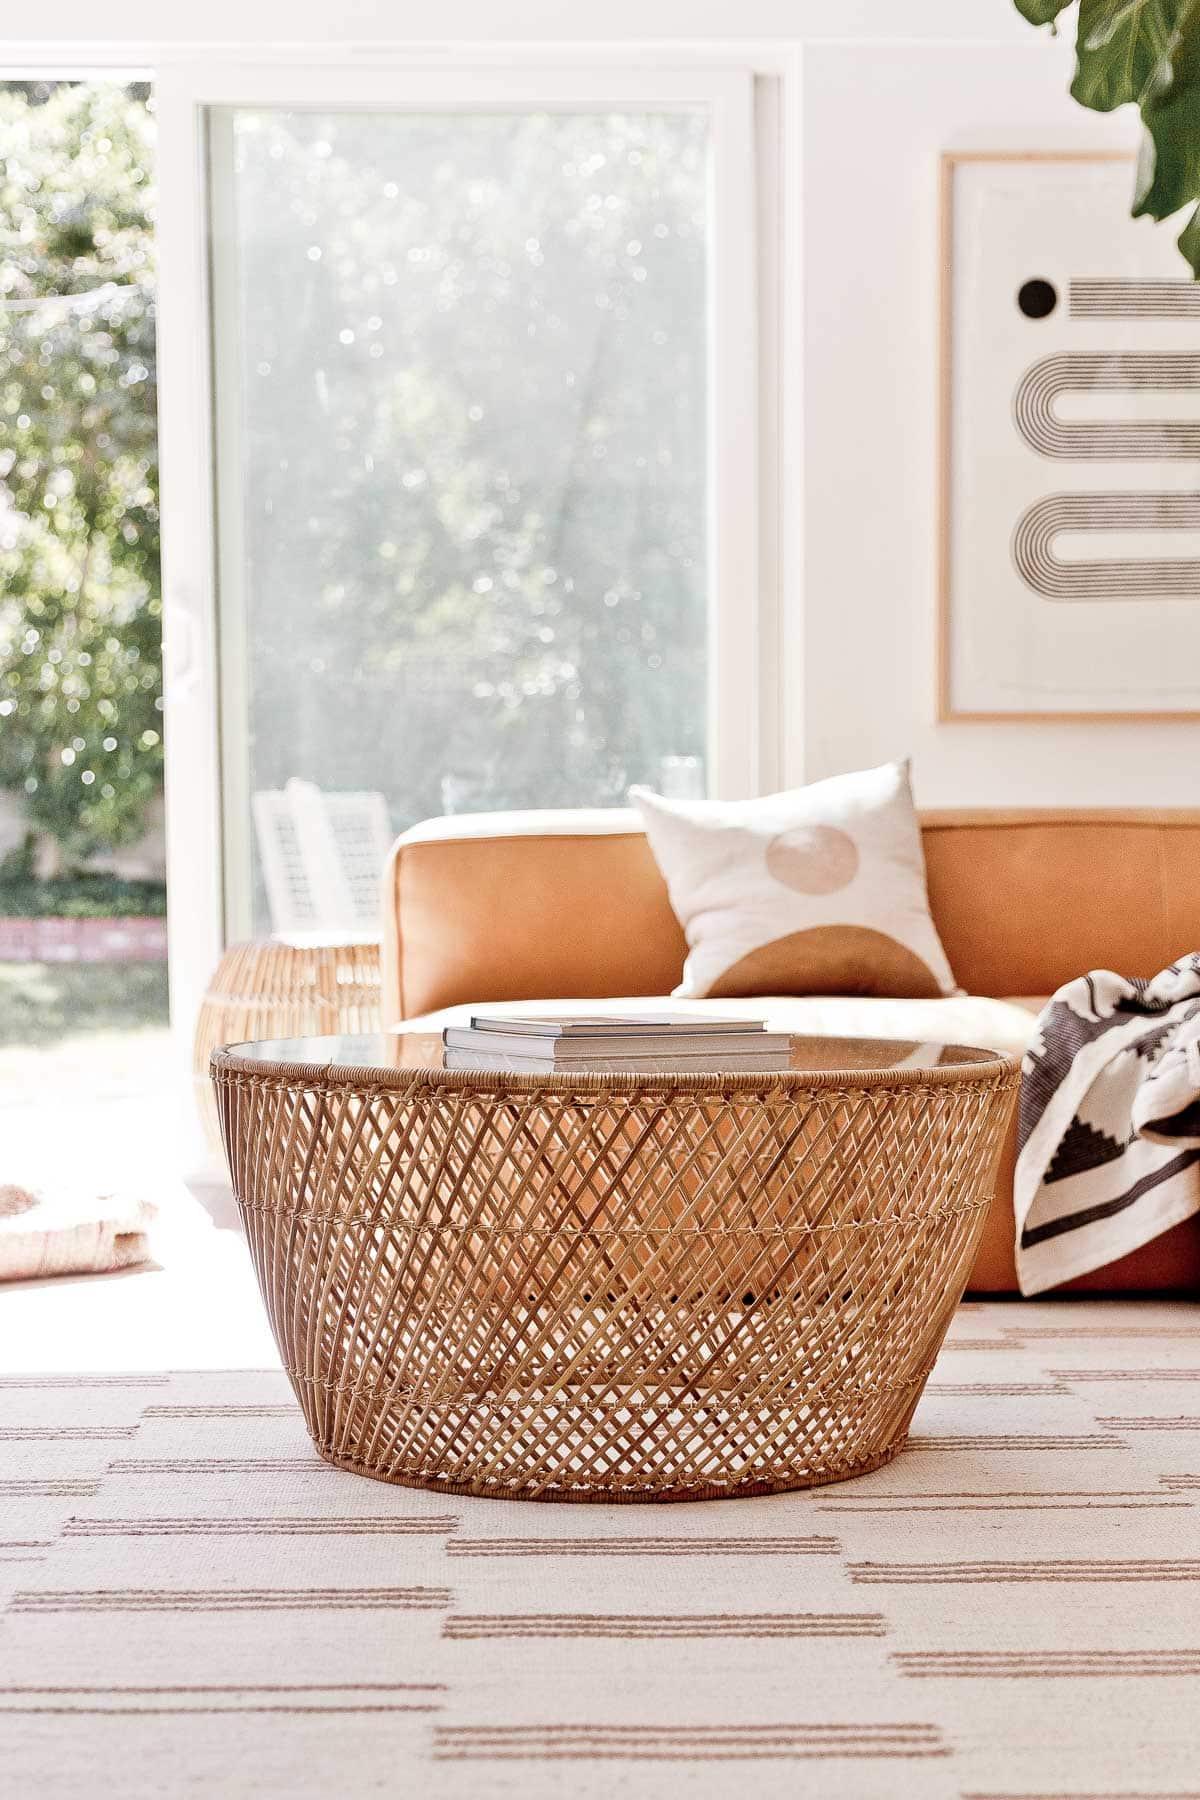 Closeup photo of Article furniture (wicker, bohemian coffee table) in modern, California home.